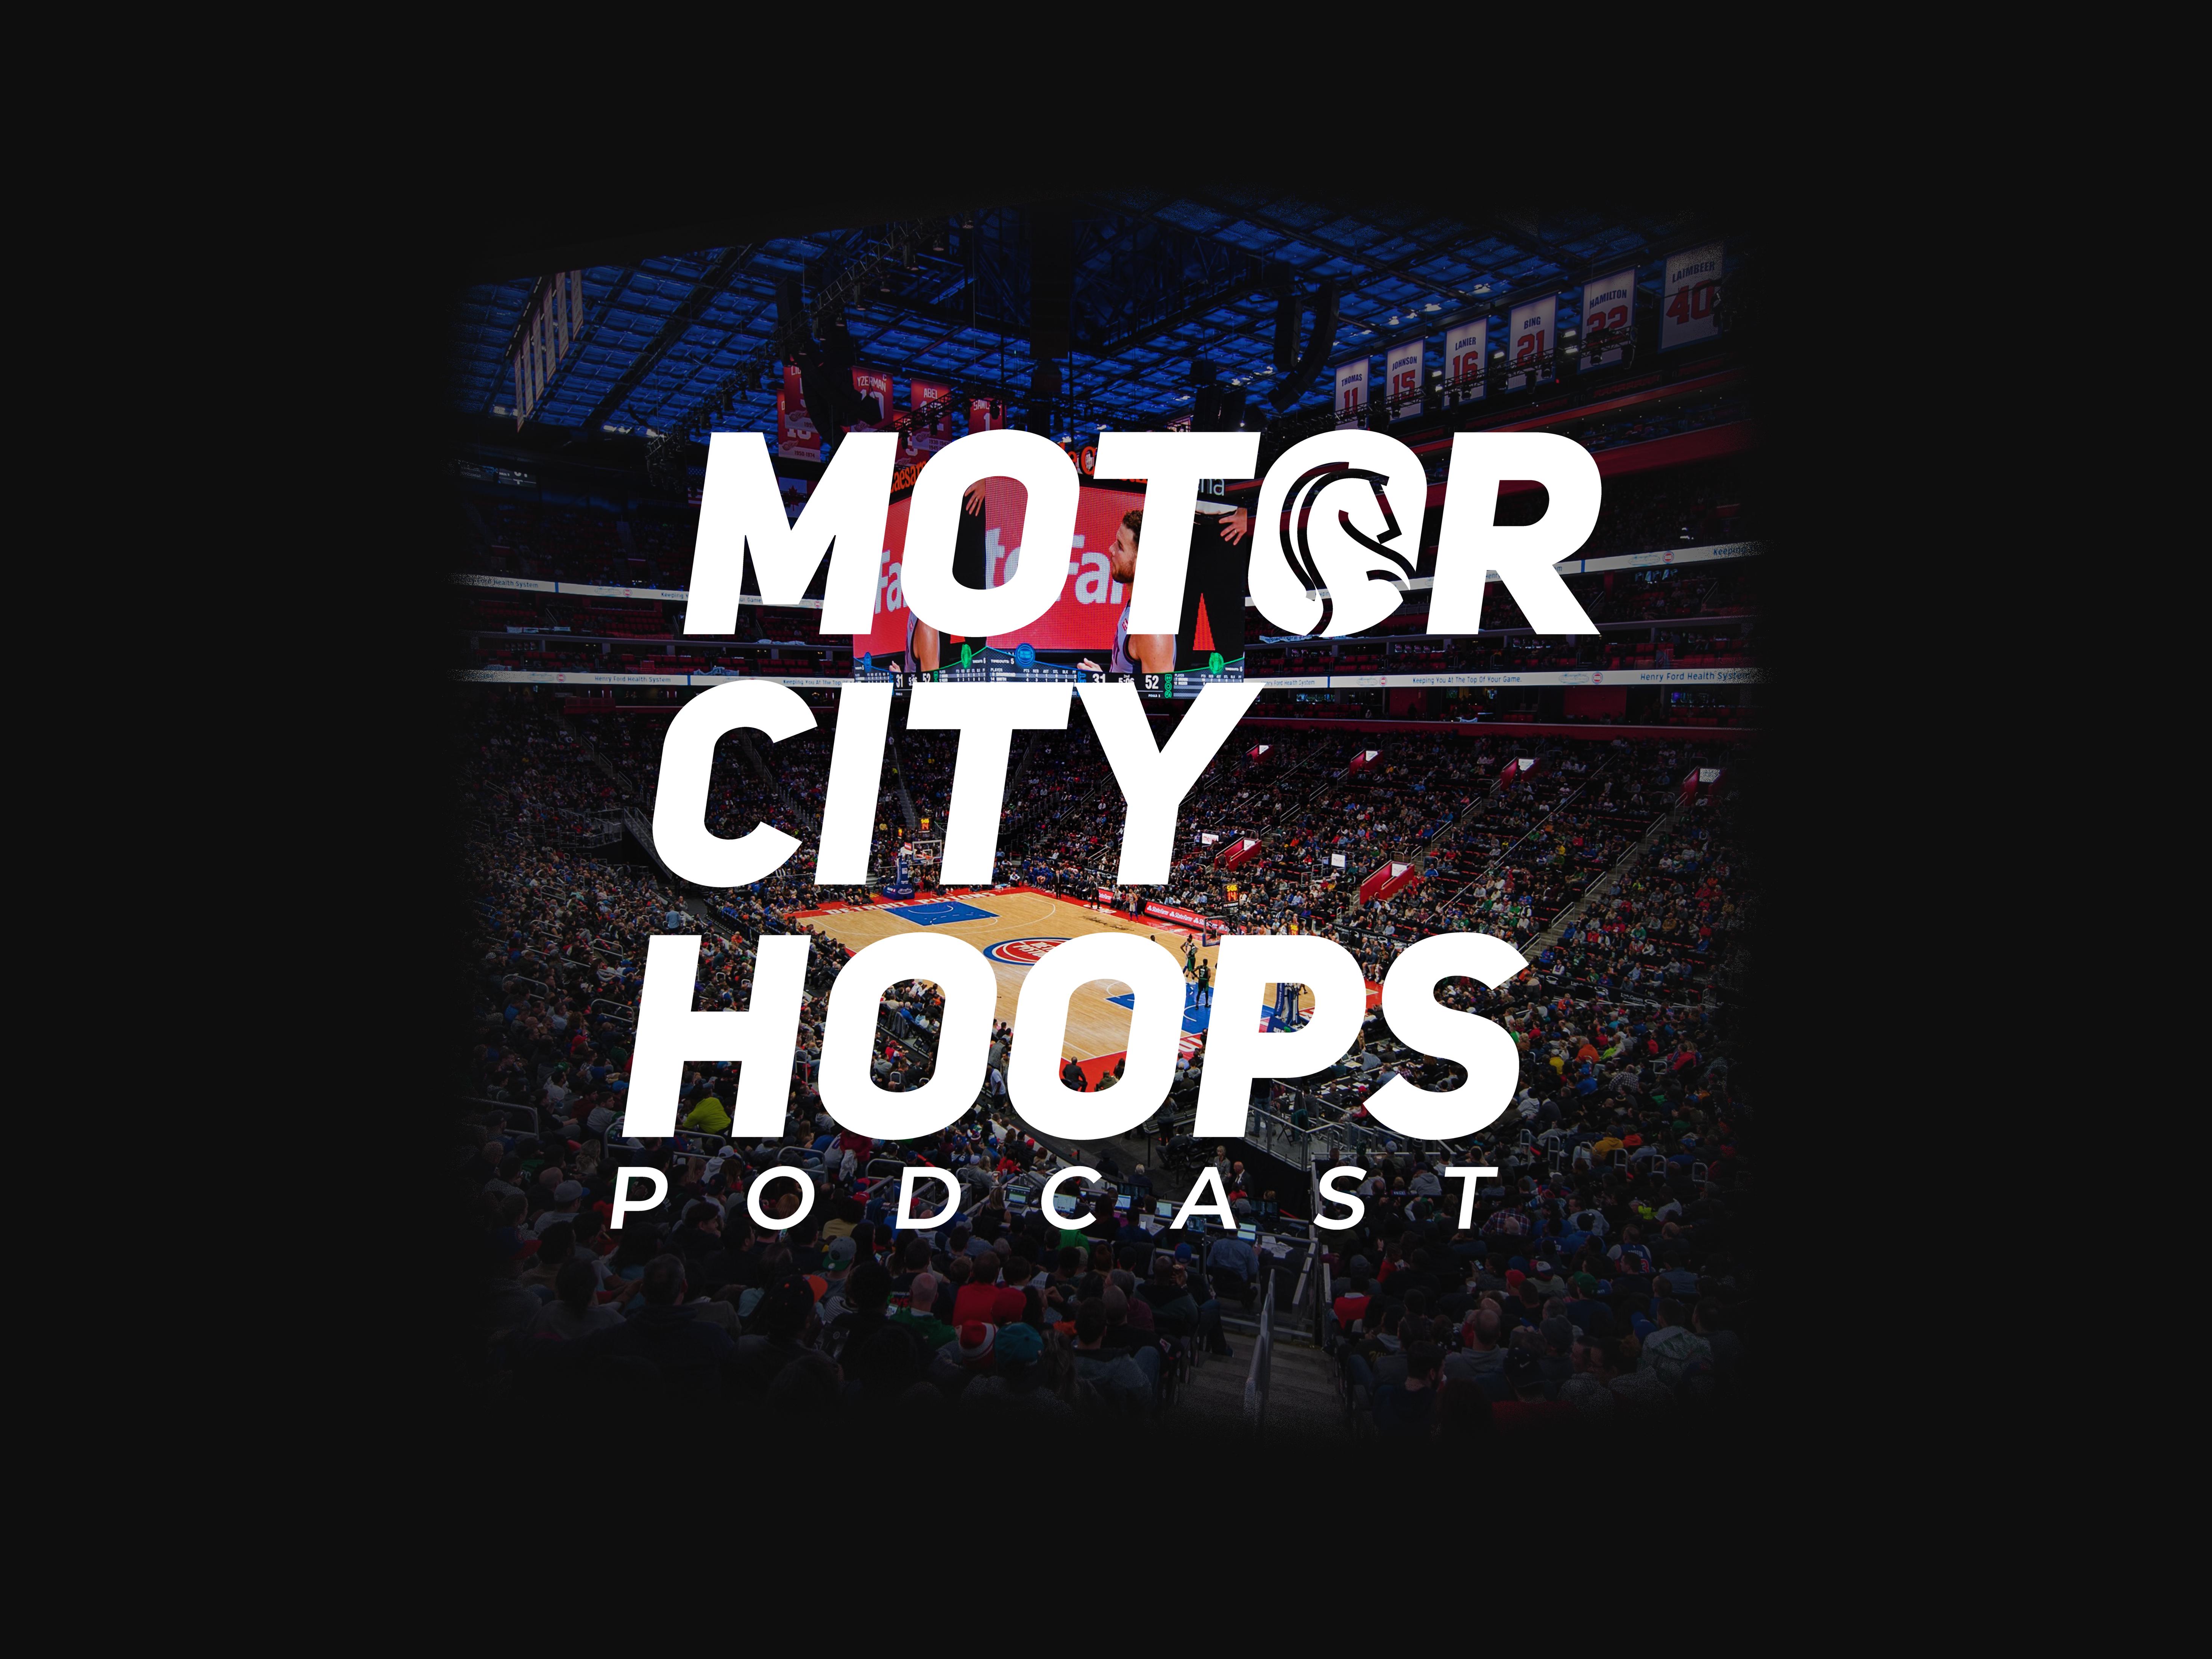 Motor City Hoops Podcast logo